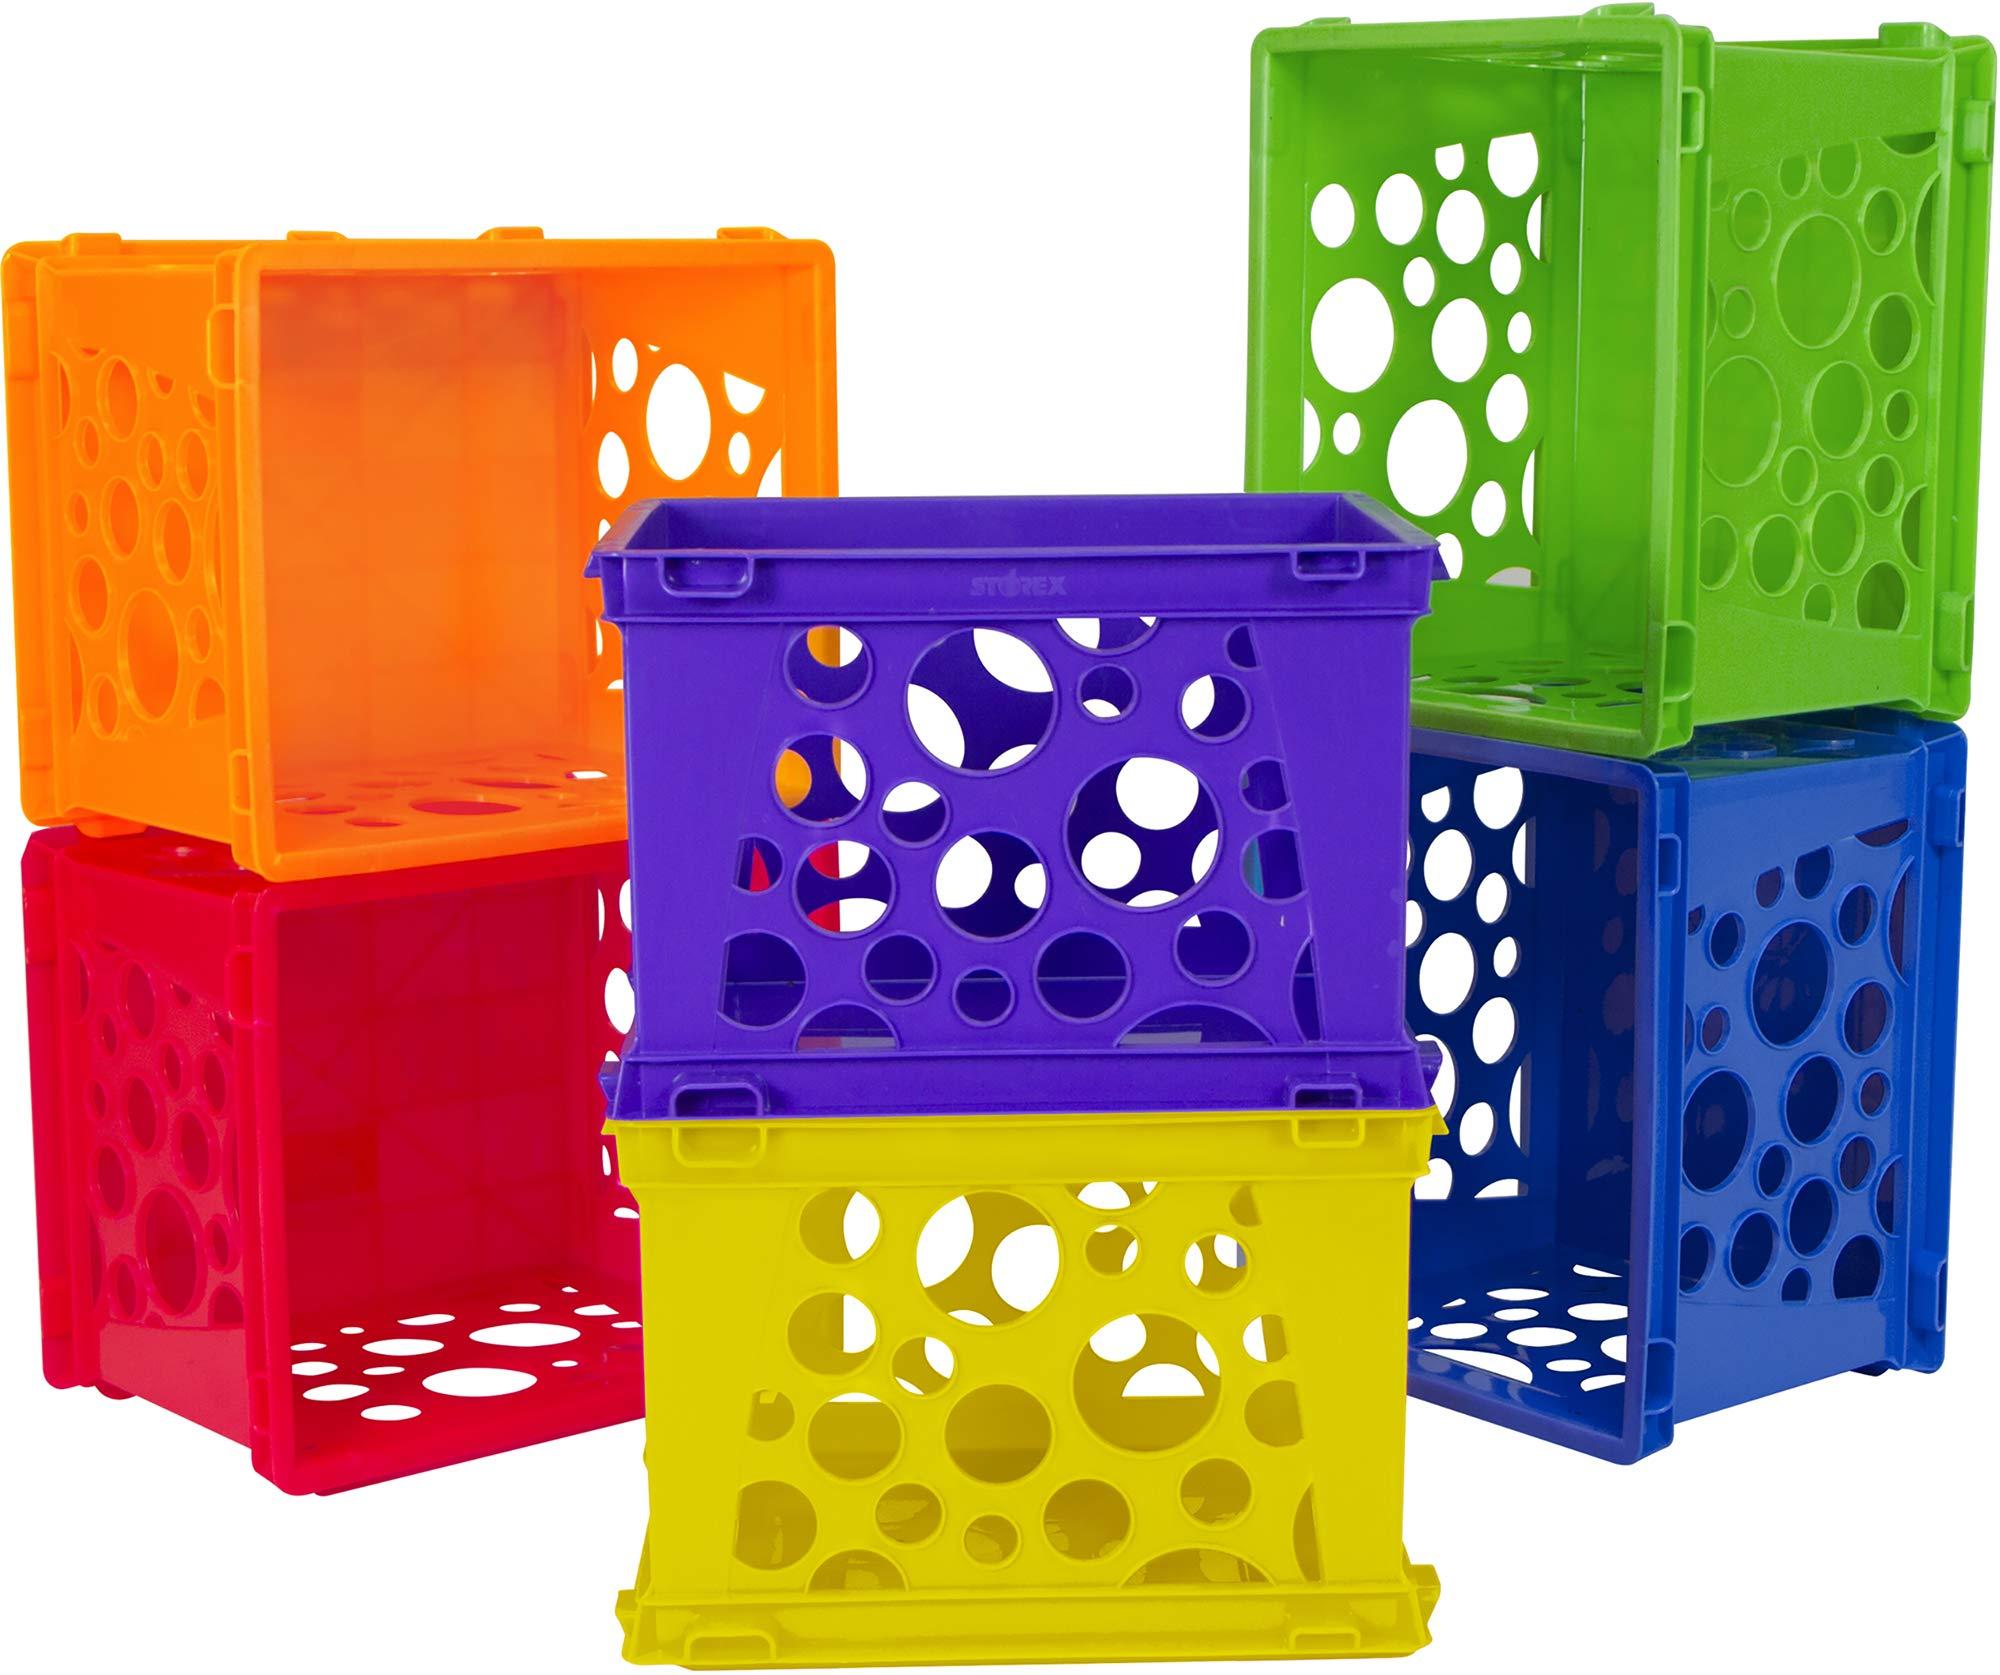 Storex Mini Crate, 9 x 7.75 x 6 Inches, Assorted Colors, 12-Pack (61474U12C) by Storex